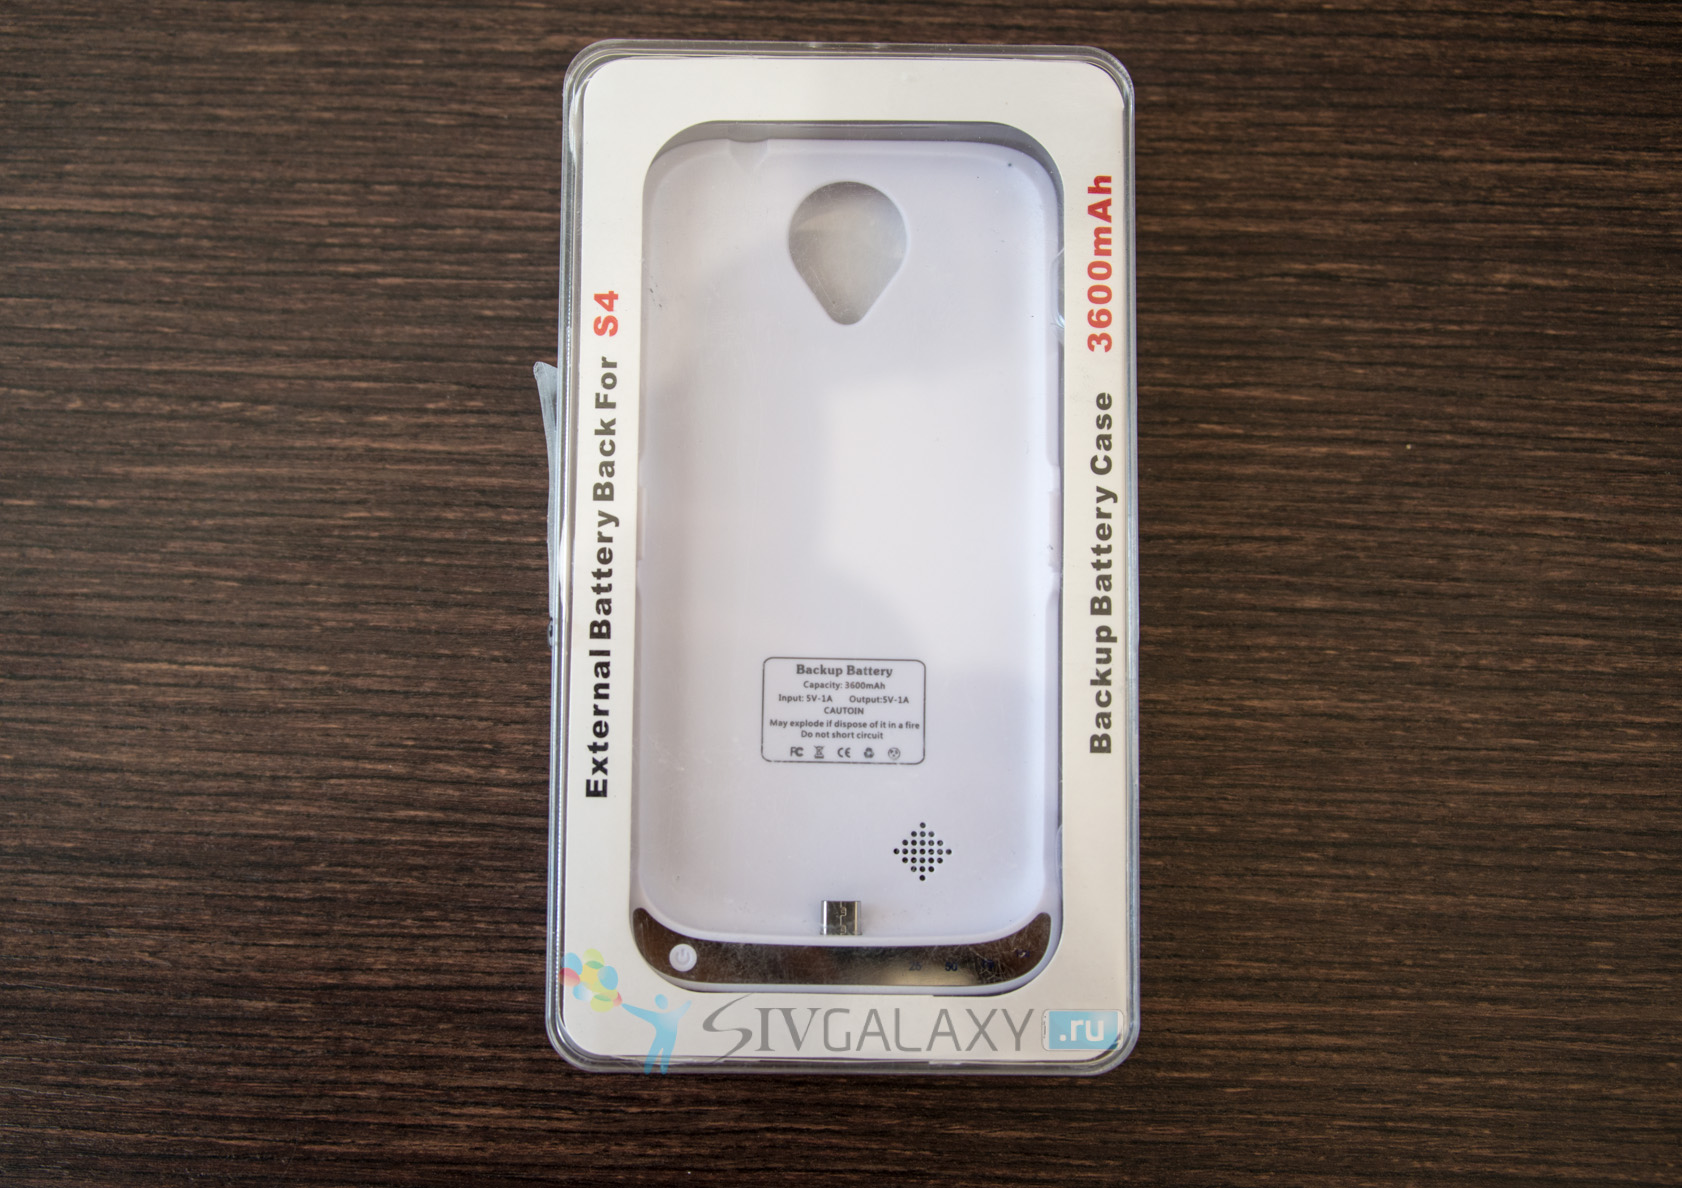 Кейс с батареей на 3600 мАч для Samsung Galaxy S4